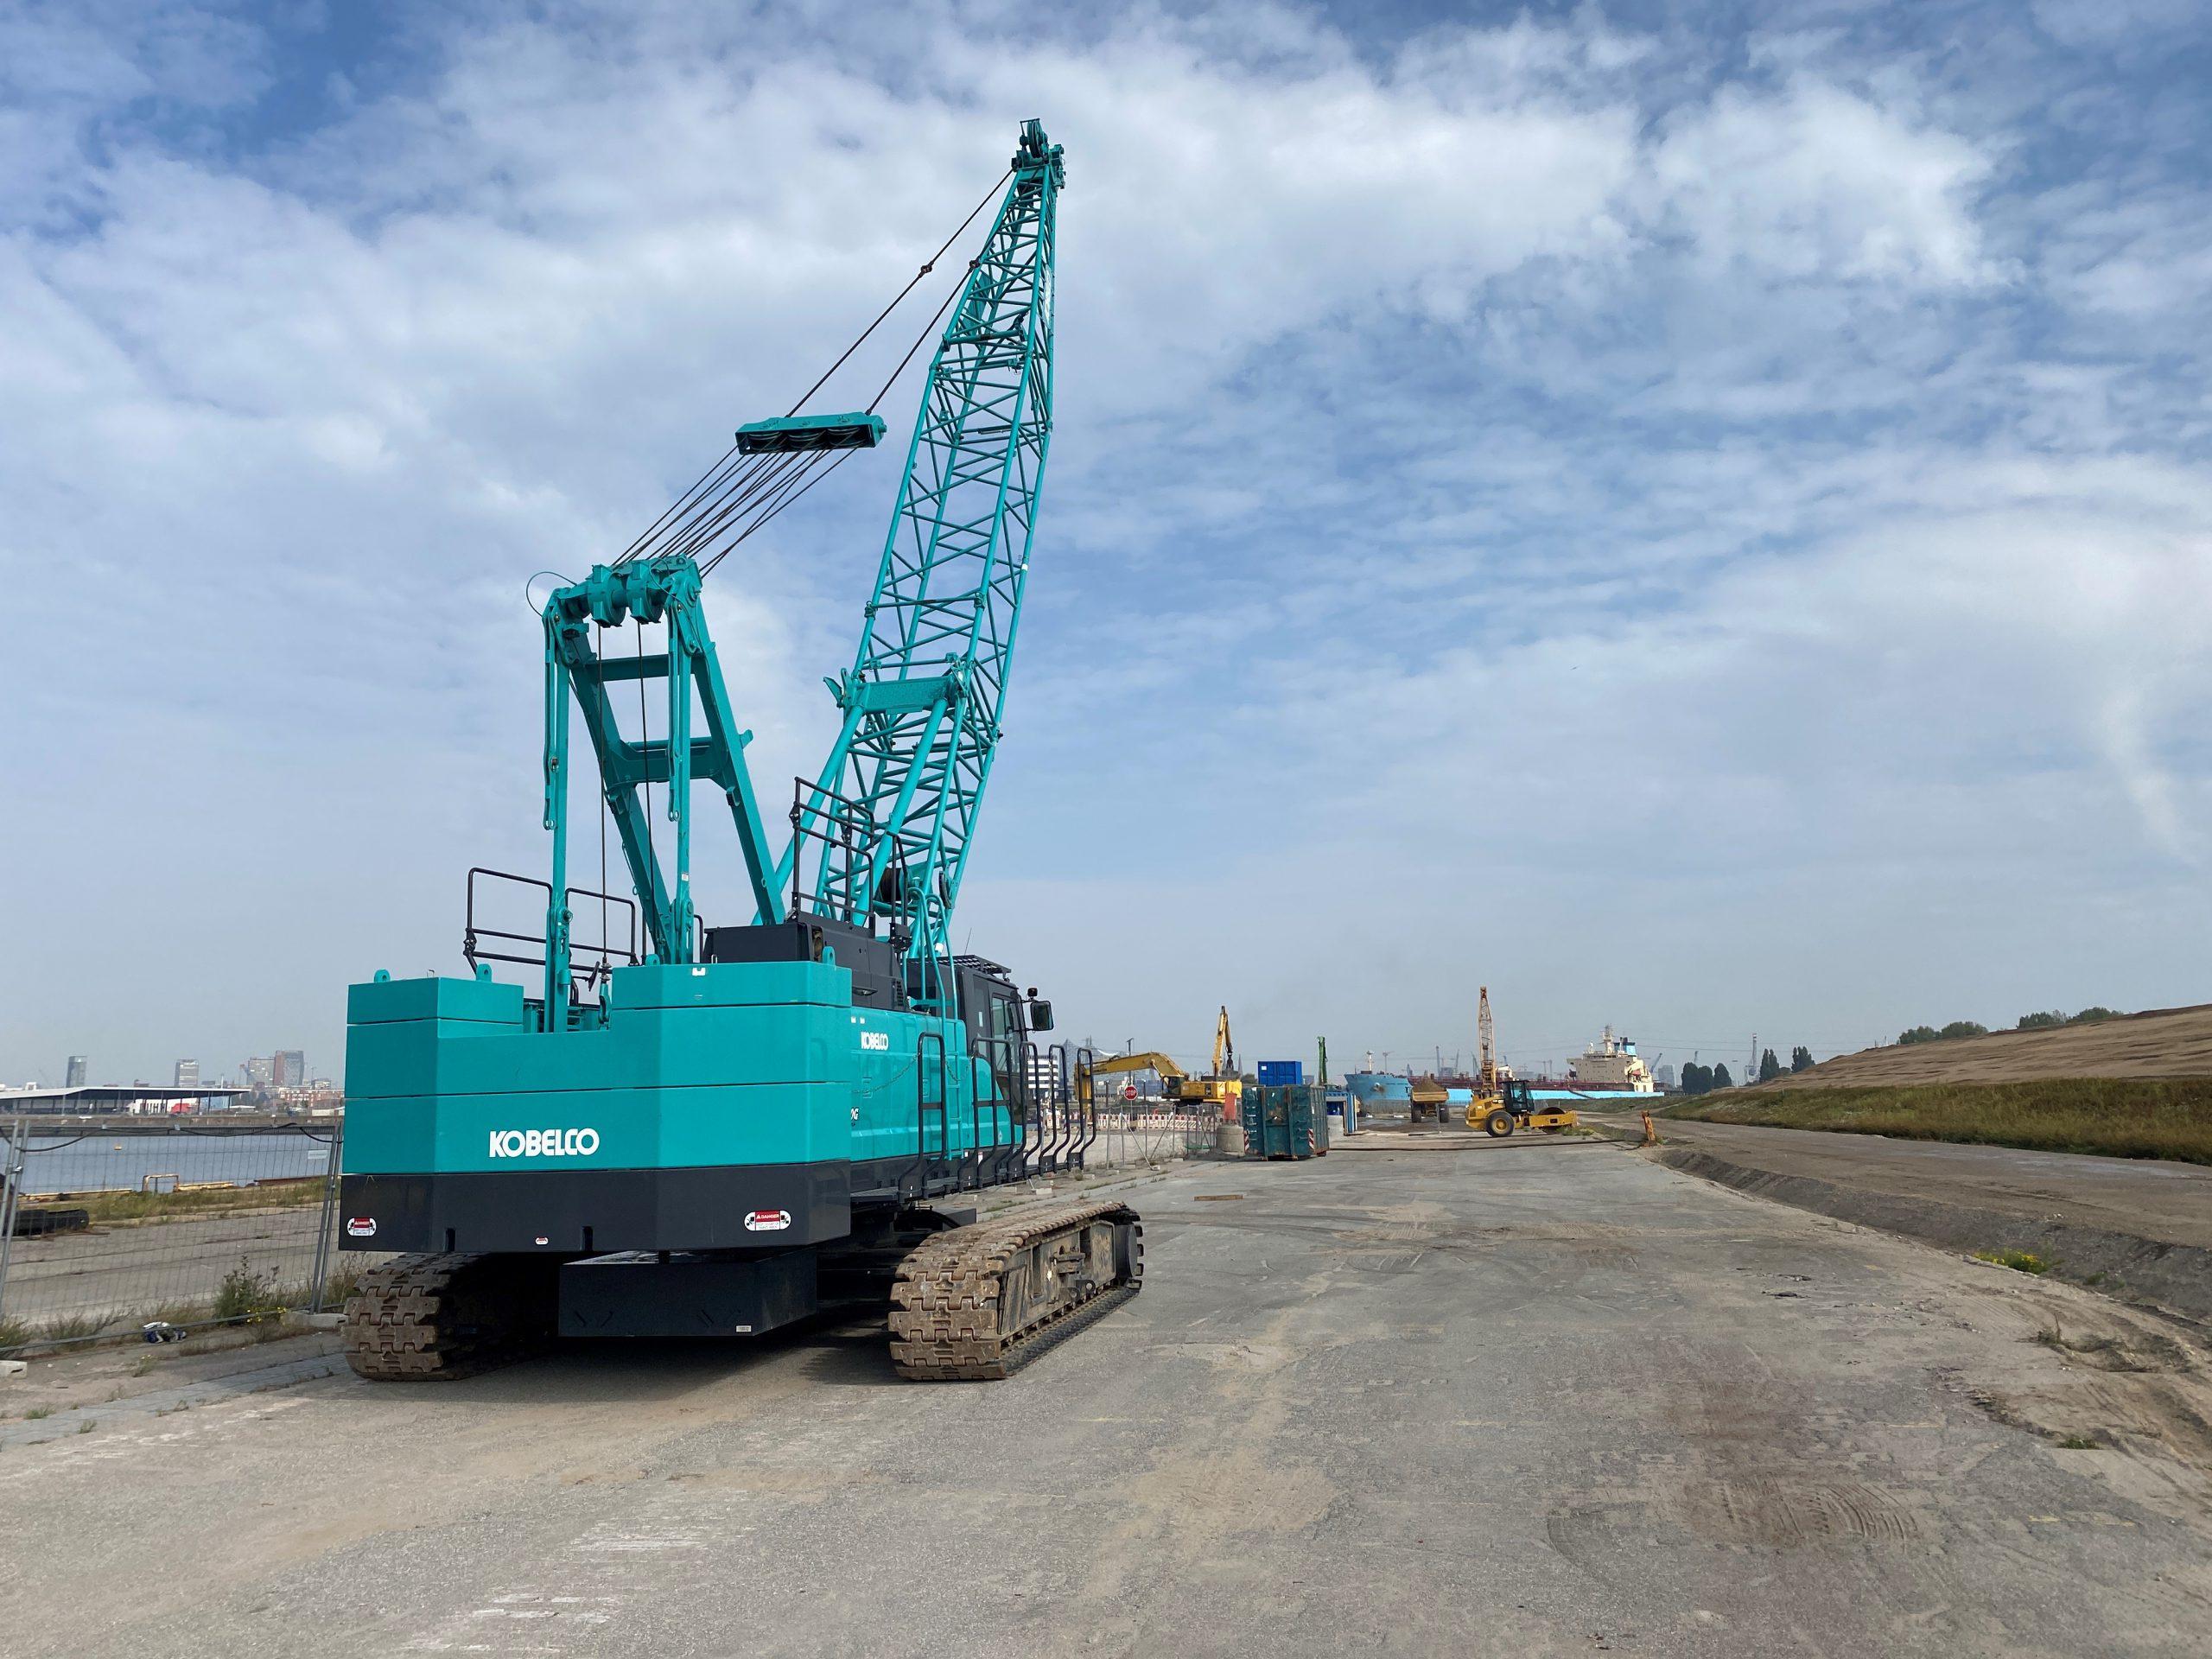 Kobelco Used Crane Finder now available at kobelco-europe.com - Kobelco Construction Machinery Europe B.V.